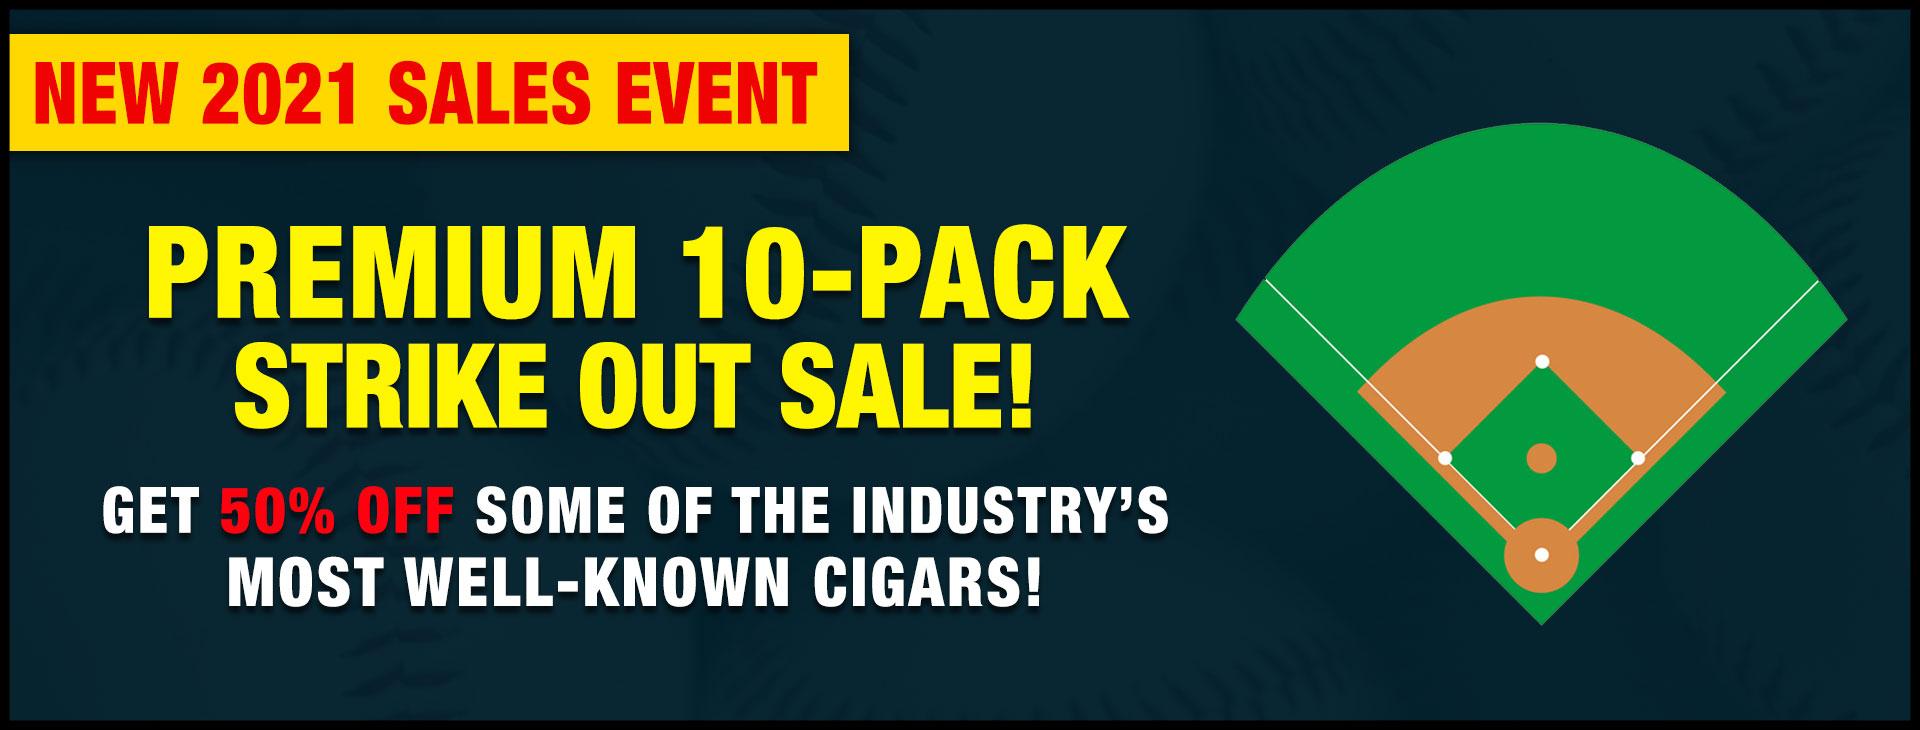 premium-10-pack-strike-out-sale-2021-banner.jpg